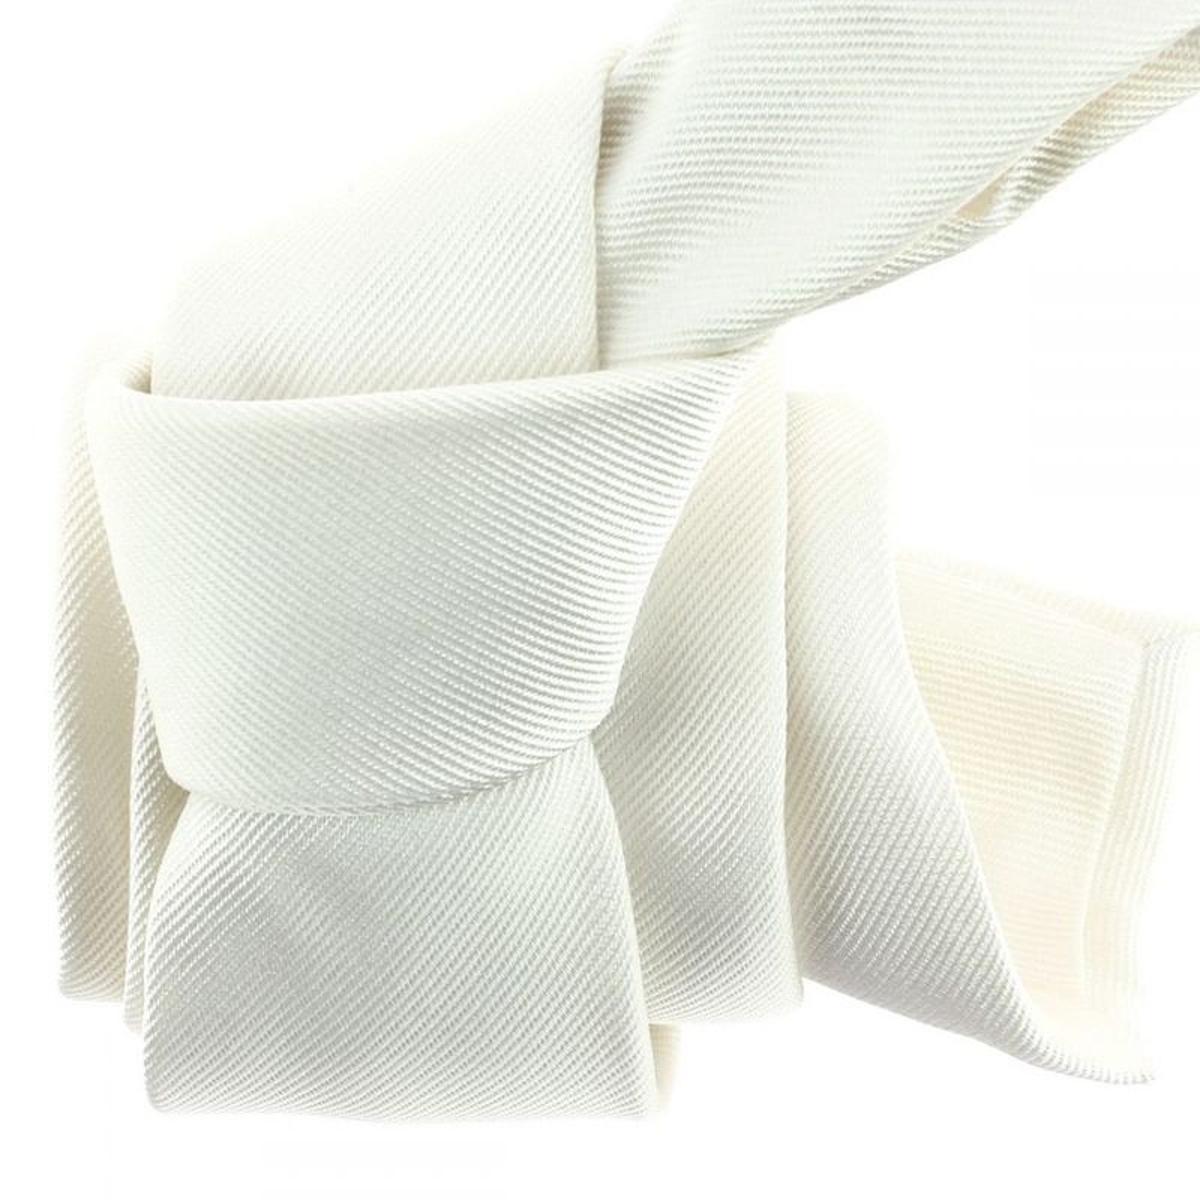 Cravate Italienne luxe soie fait main